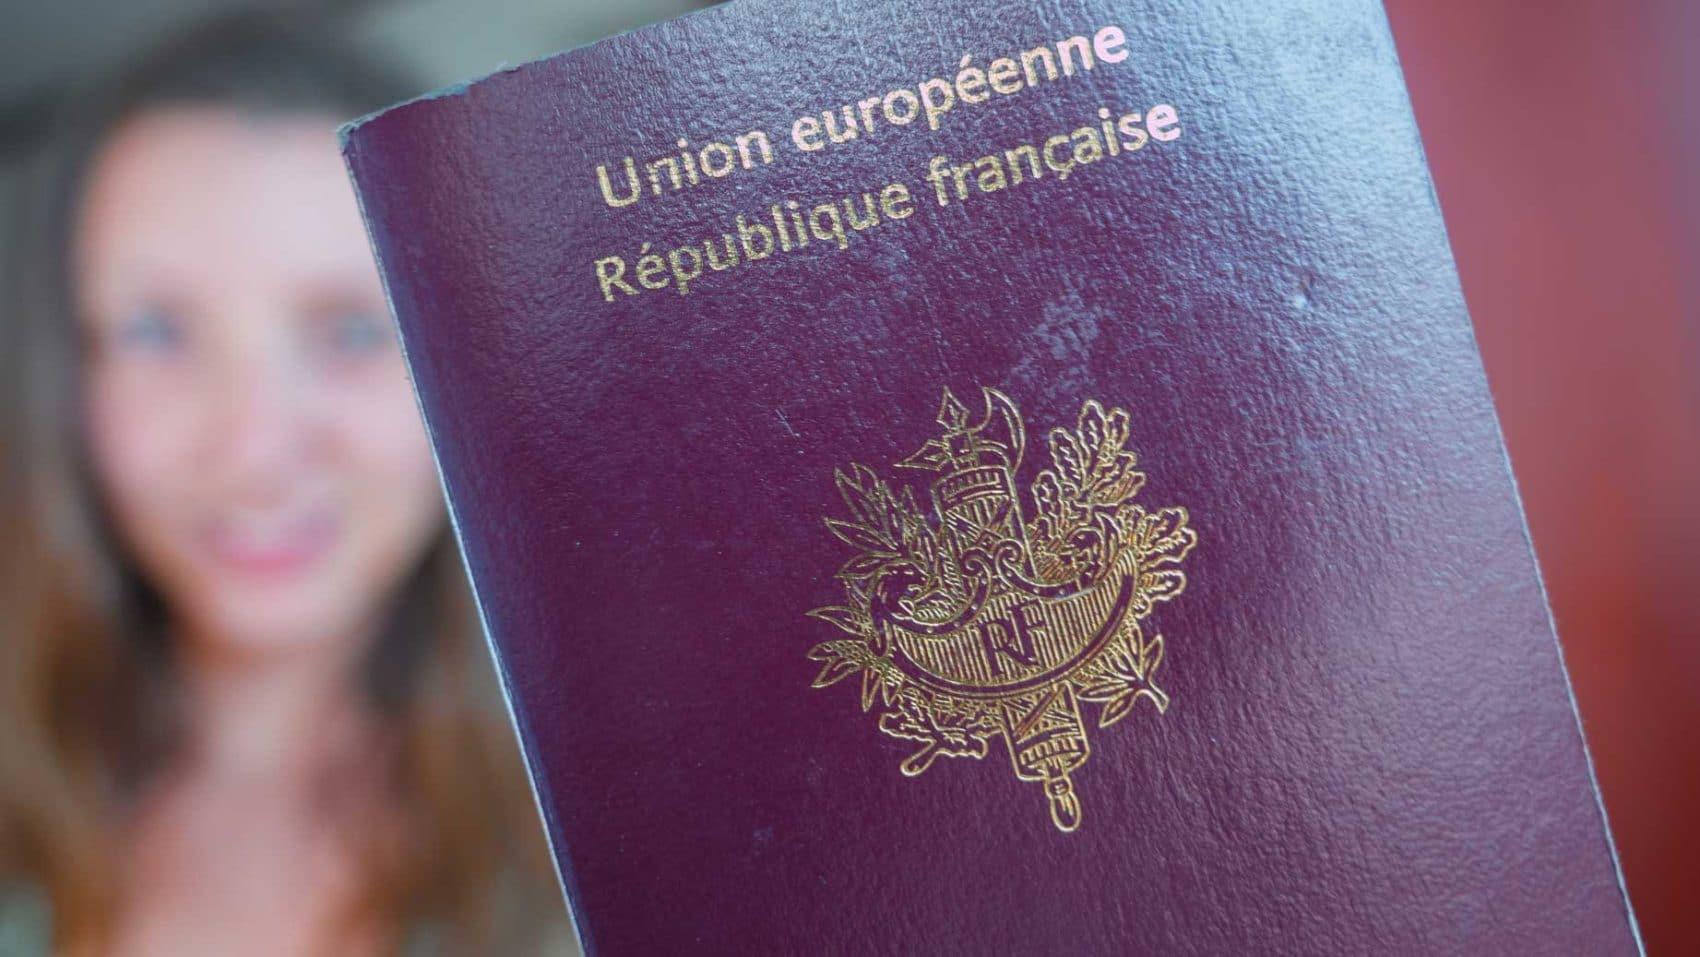 Sri Lanka : Comment obtenir votre visa facilement ?